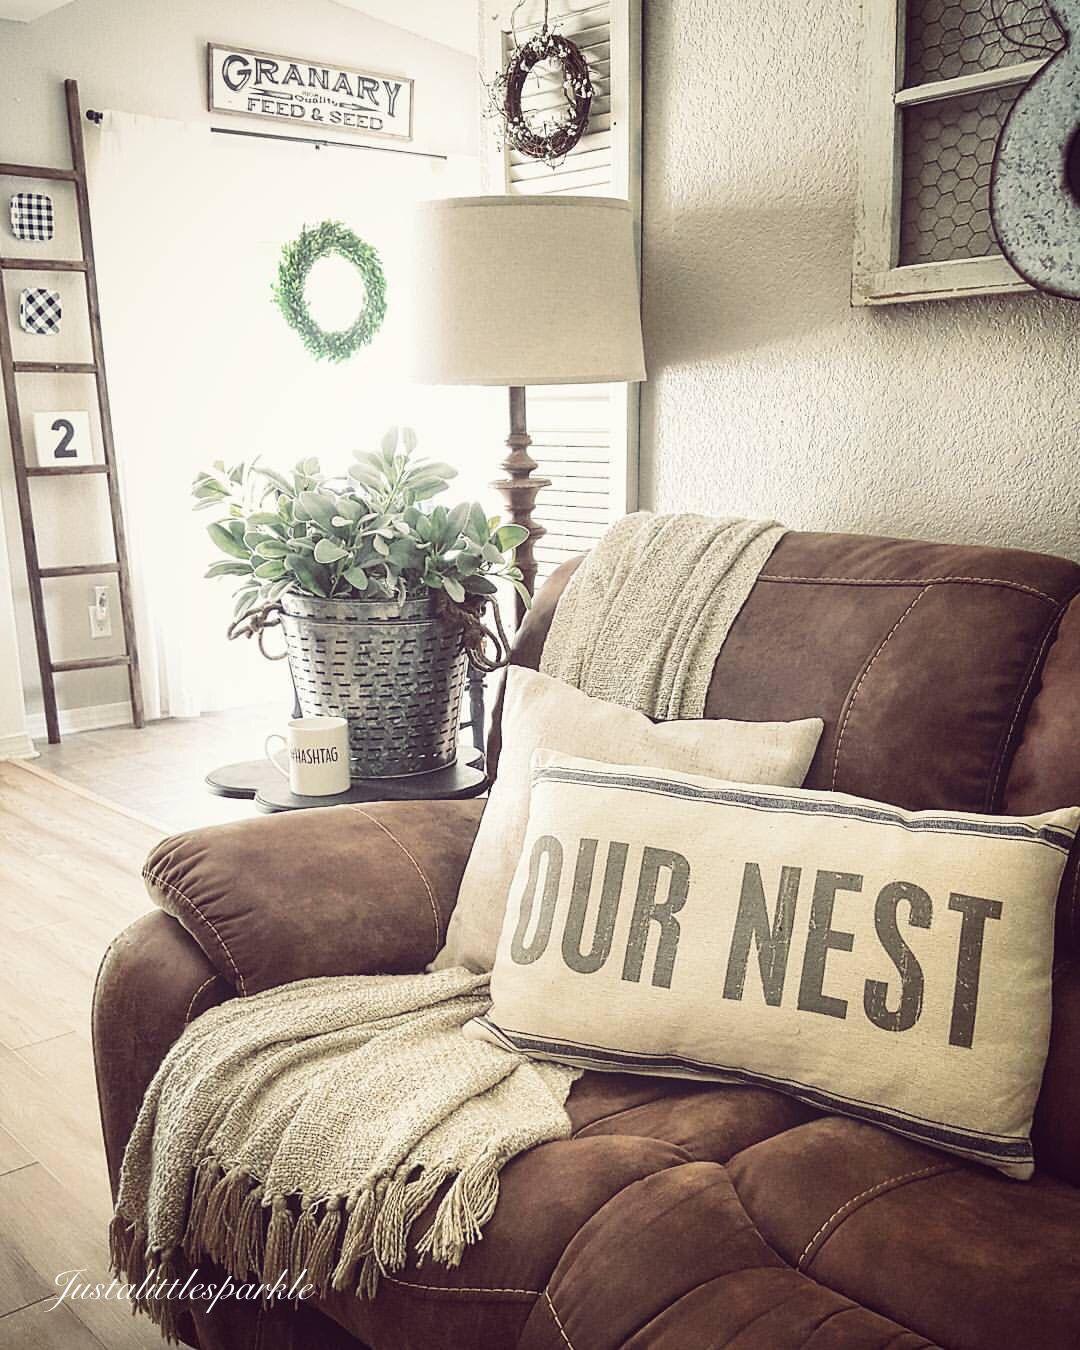 Farmhouse decor farmhouse pillow our nest pillow rustic